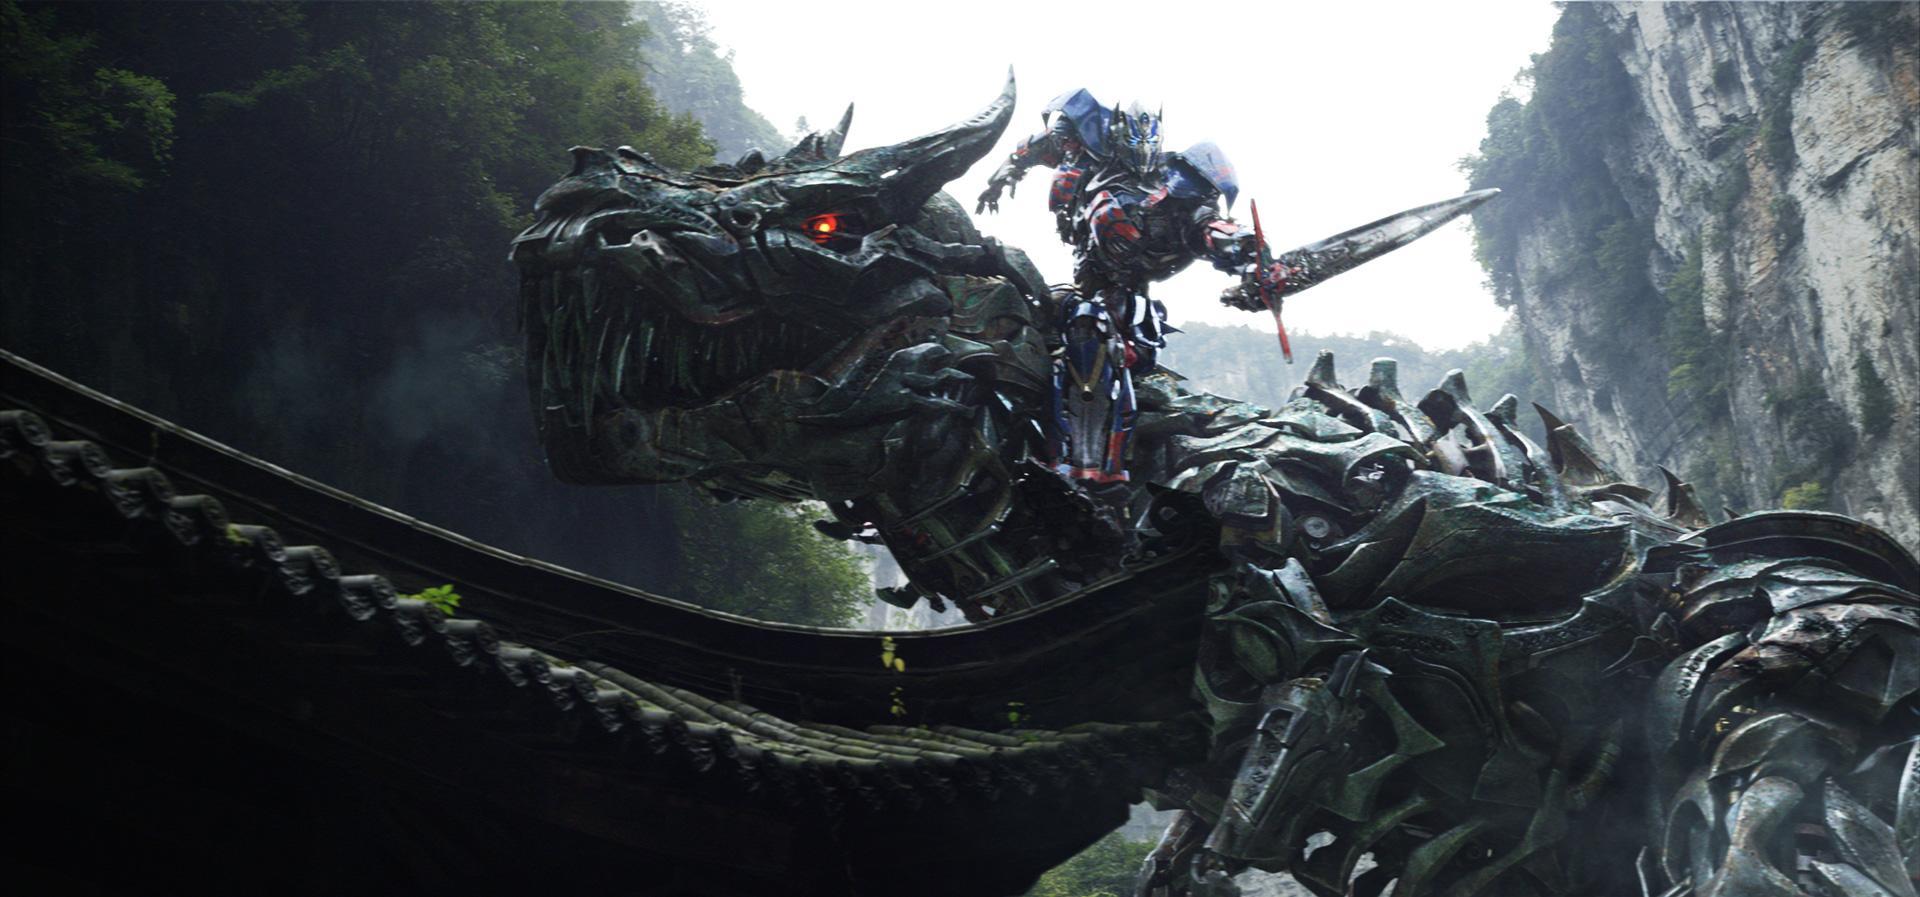 Transformers: Age of Extinction Super Bowl trailer ...